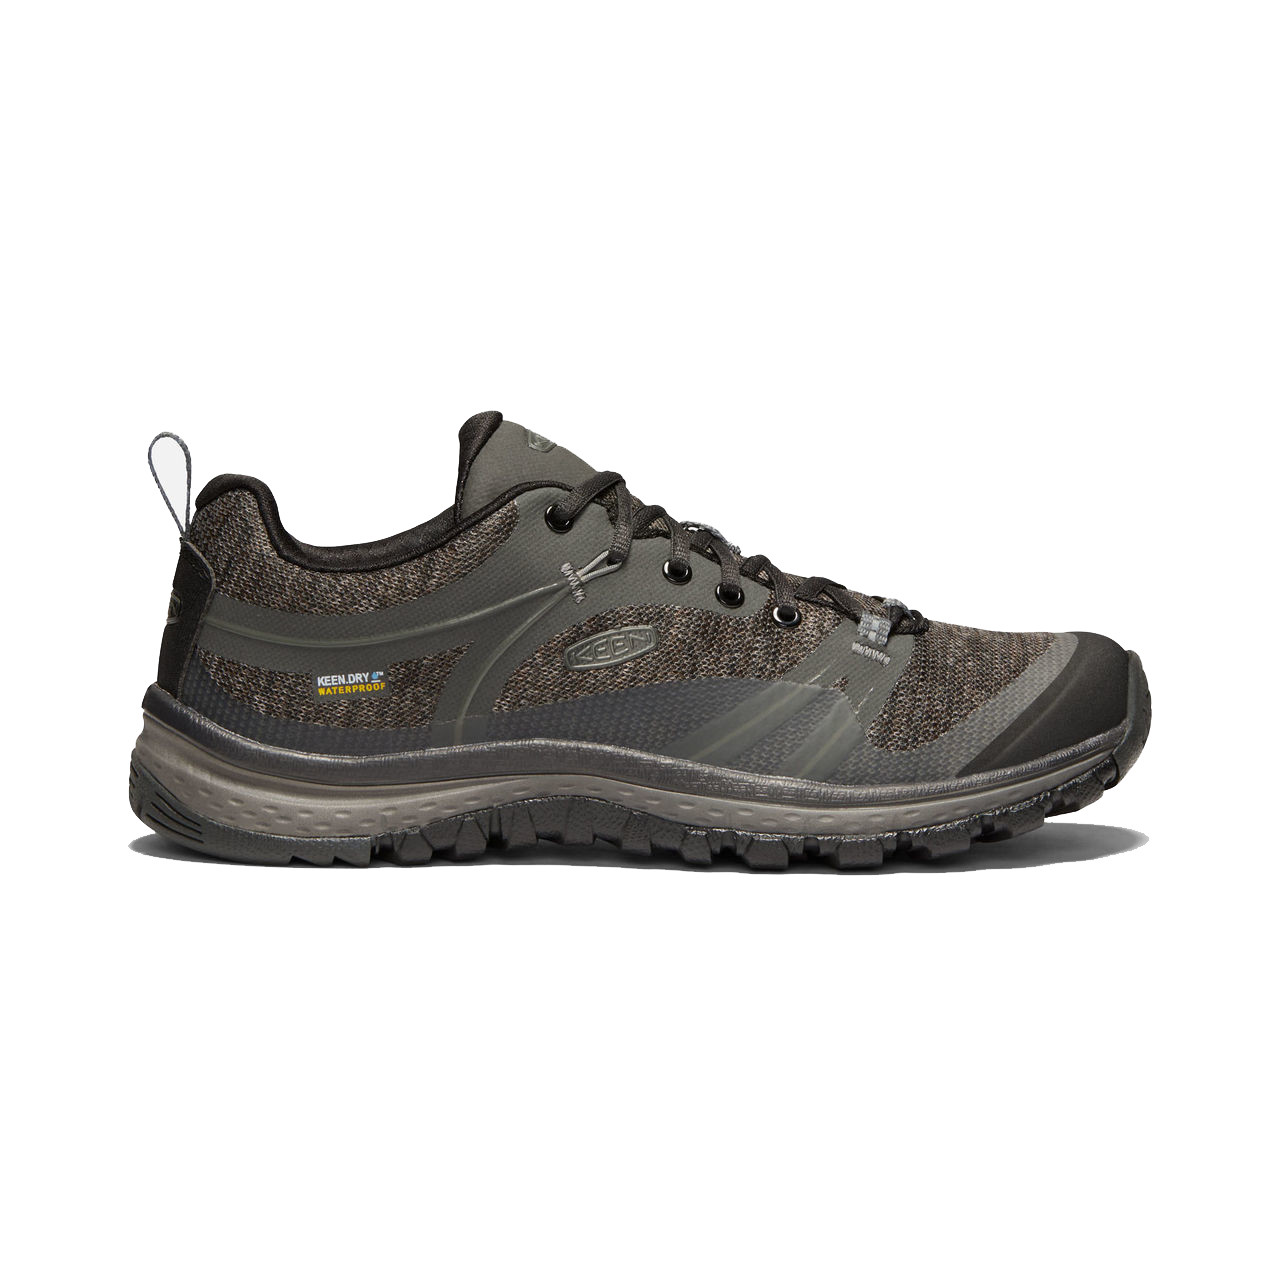 7 7.5 8 10 NEW KEEN Women/'s Terradora Waterproof hiking shoes Raven//Gargoyle 6